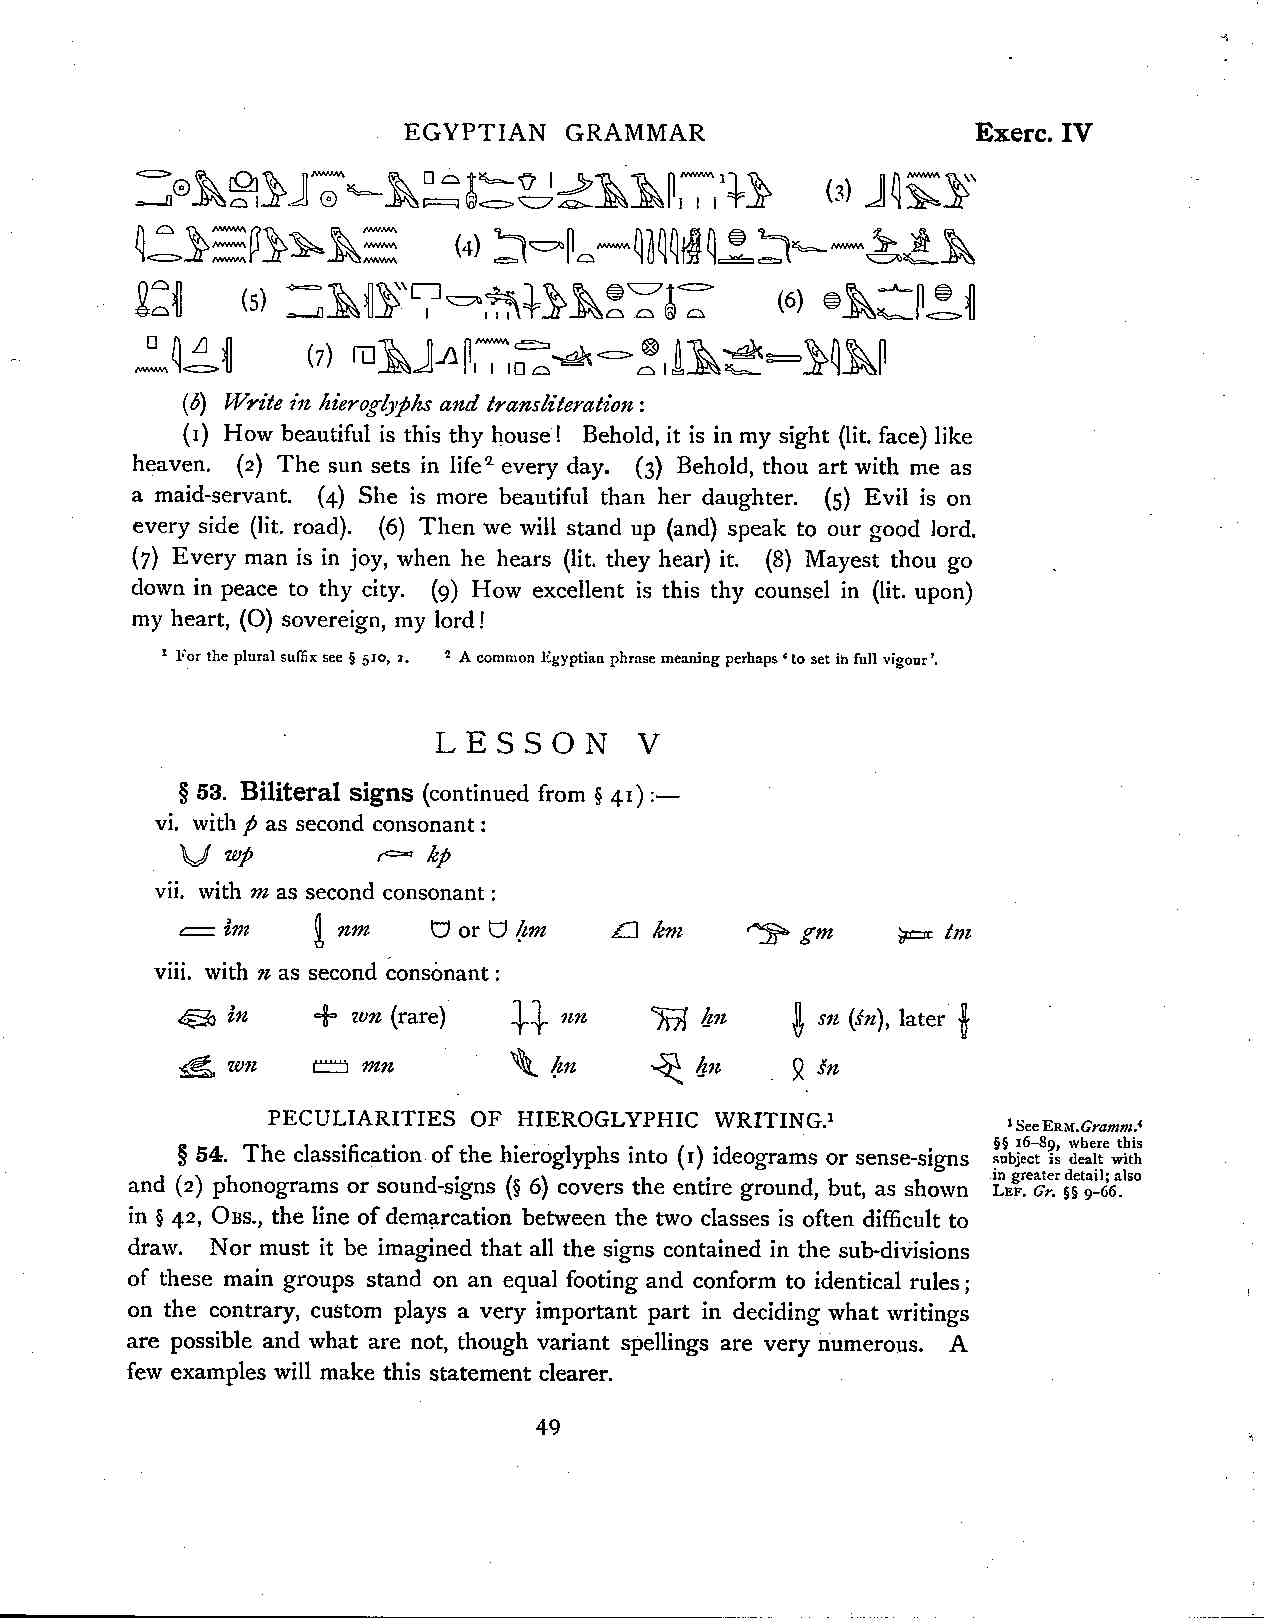 Middle Egyptian Lesson IV and V (2).jpg